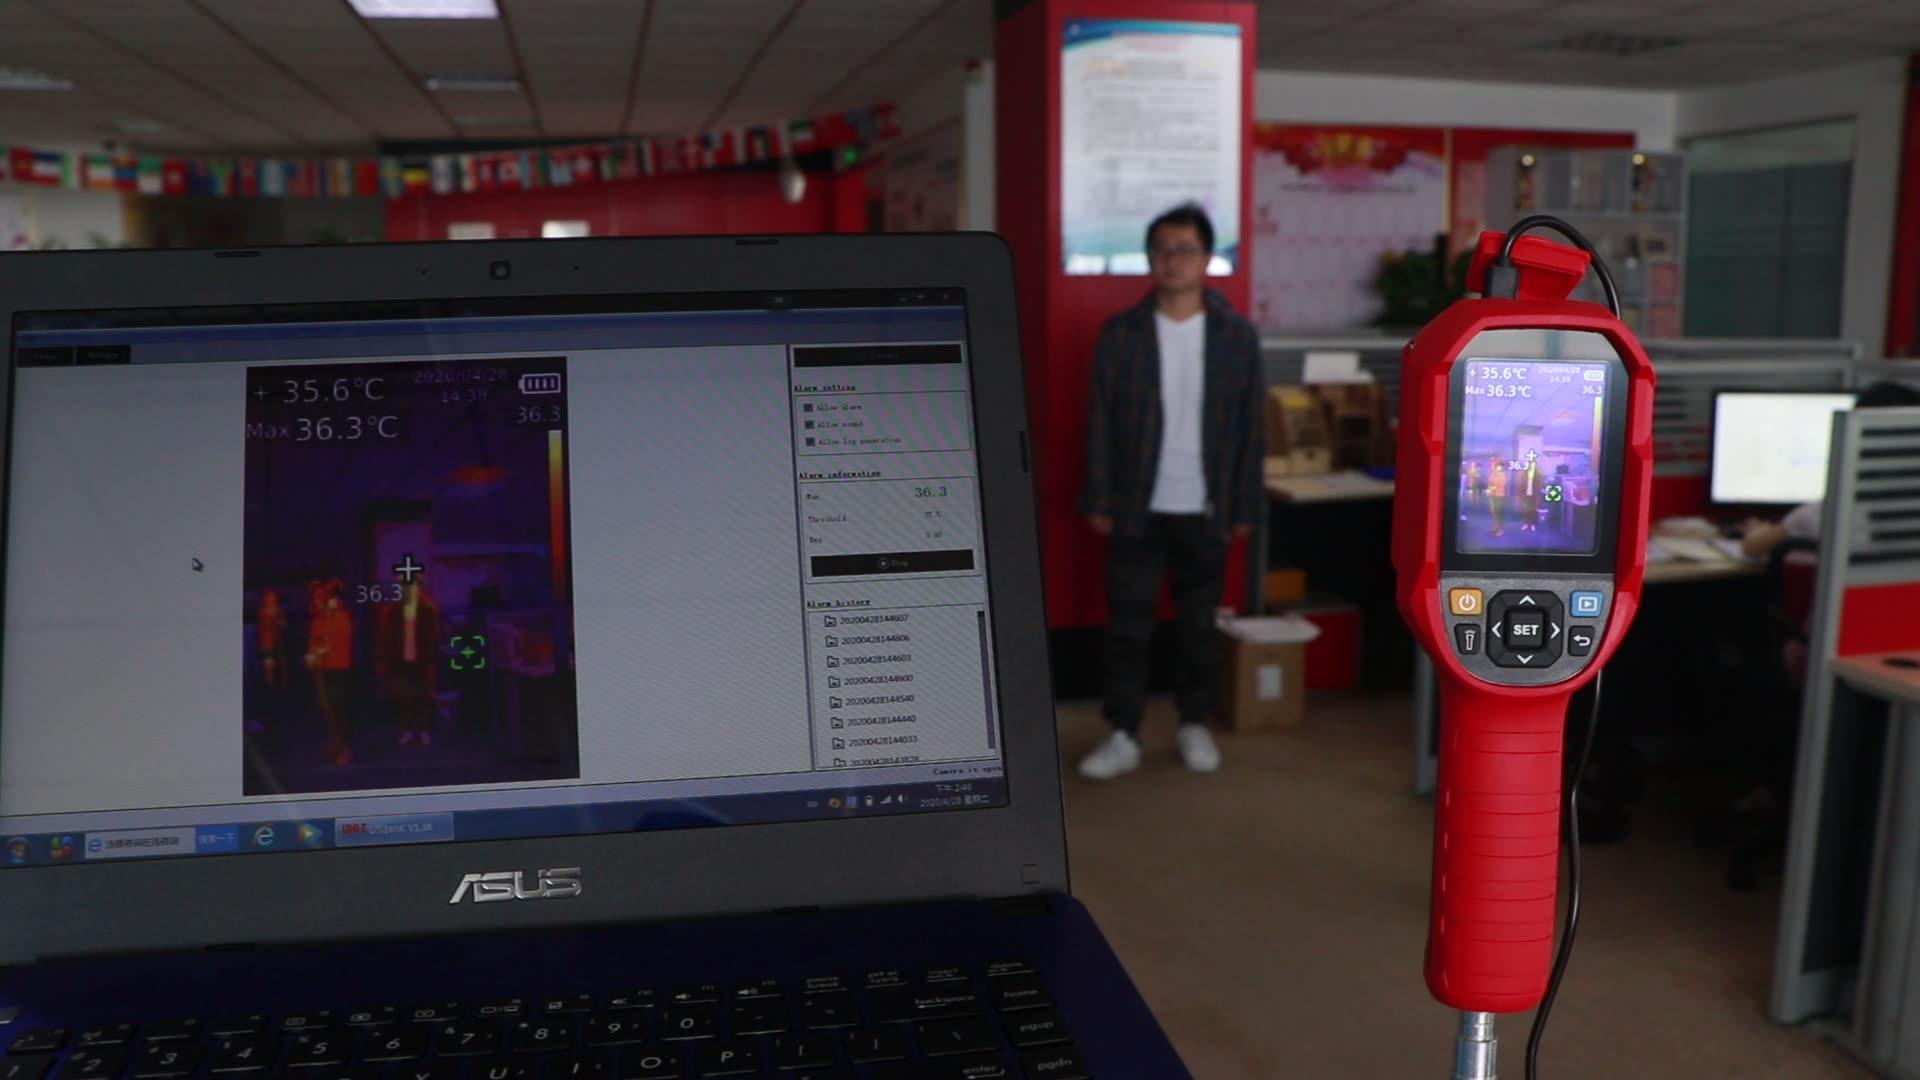 PC Projection Sound Alarm Handheld Portable Thermal Camera CE Certification Digital Imager Heat Detector Fever Scanner